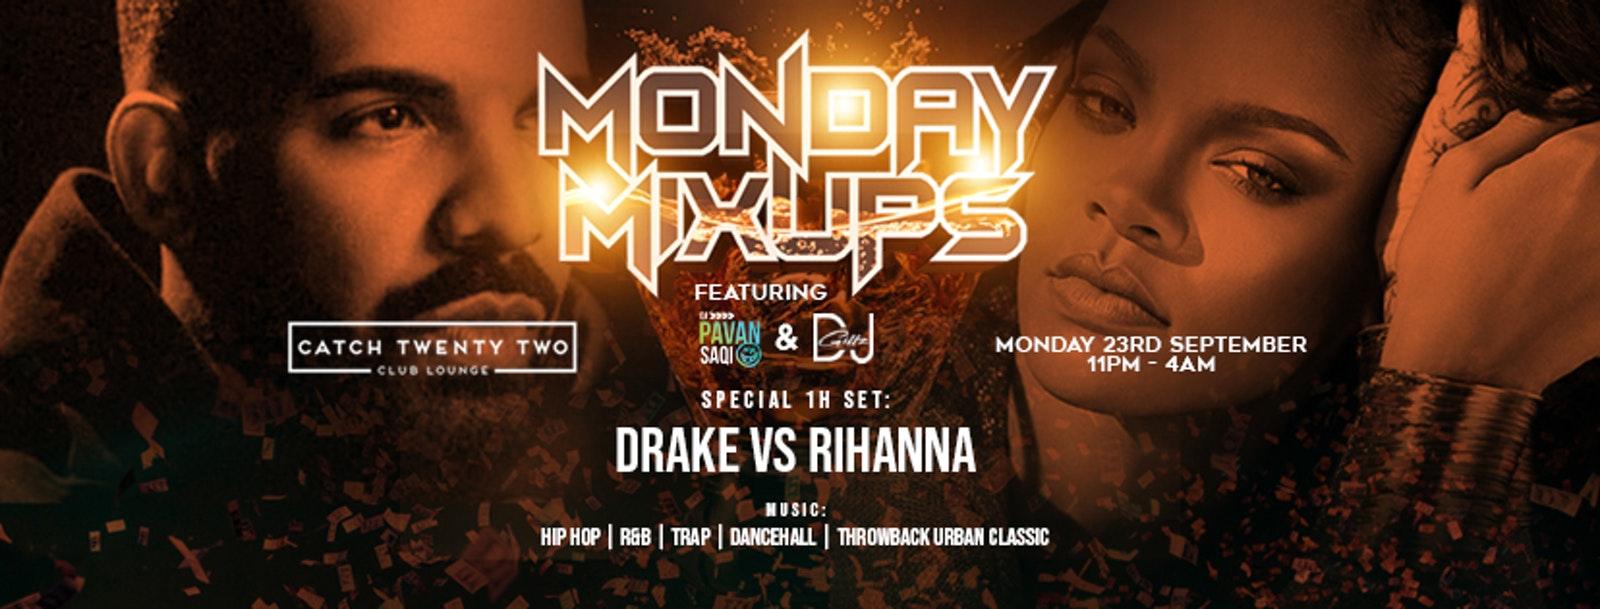 Monday Mixup – Drake vs Rihanna / Coventry Freshers